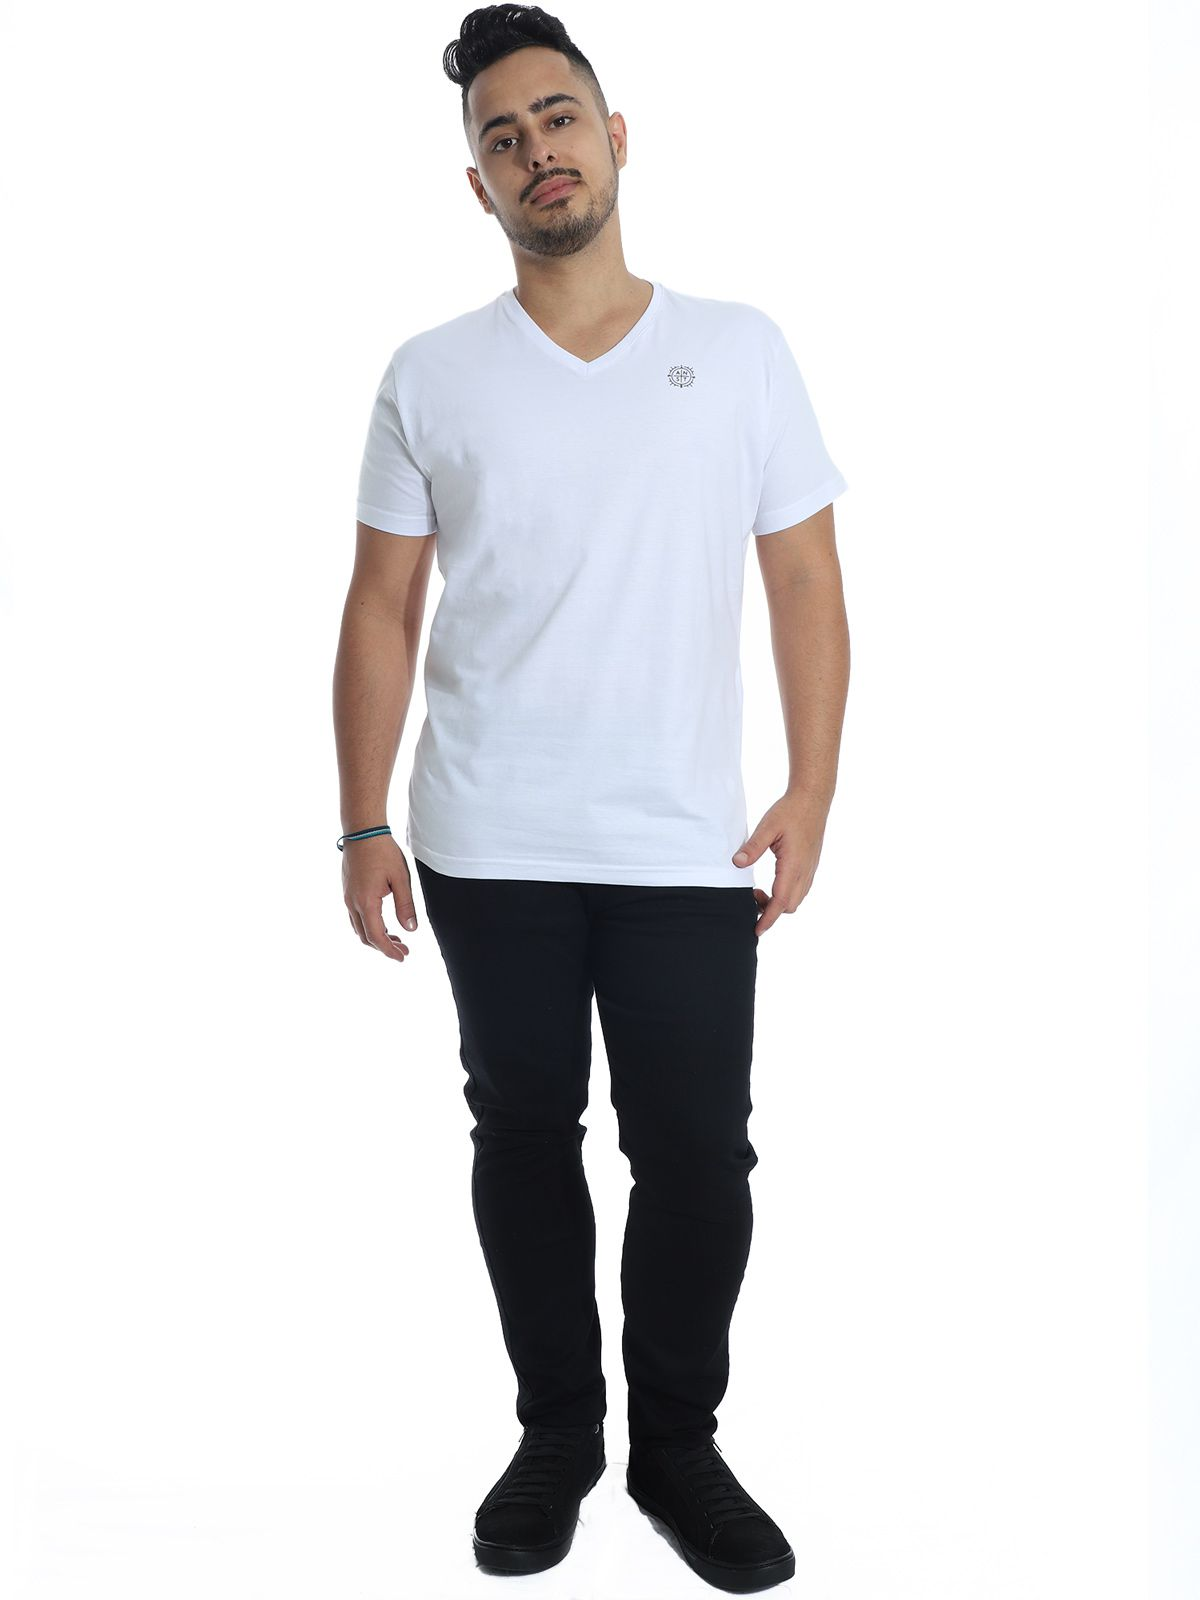 Camiseta Anistia Slim Fit Decote V. ANST Branco